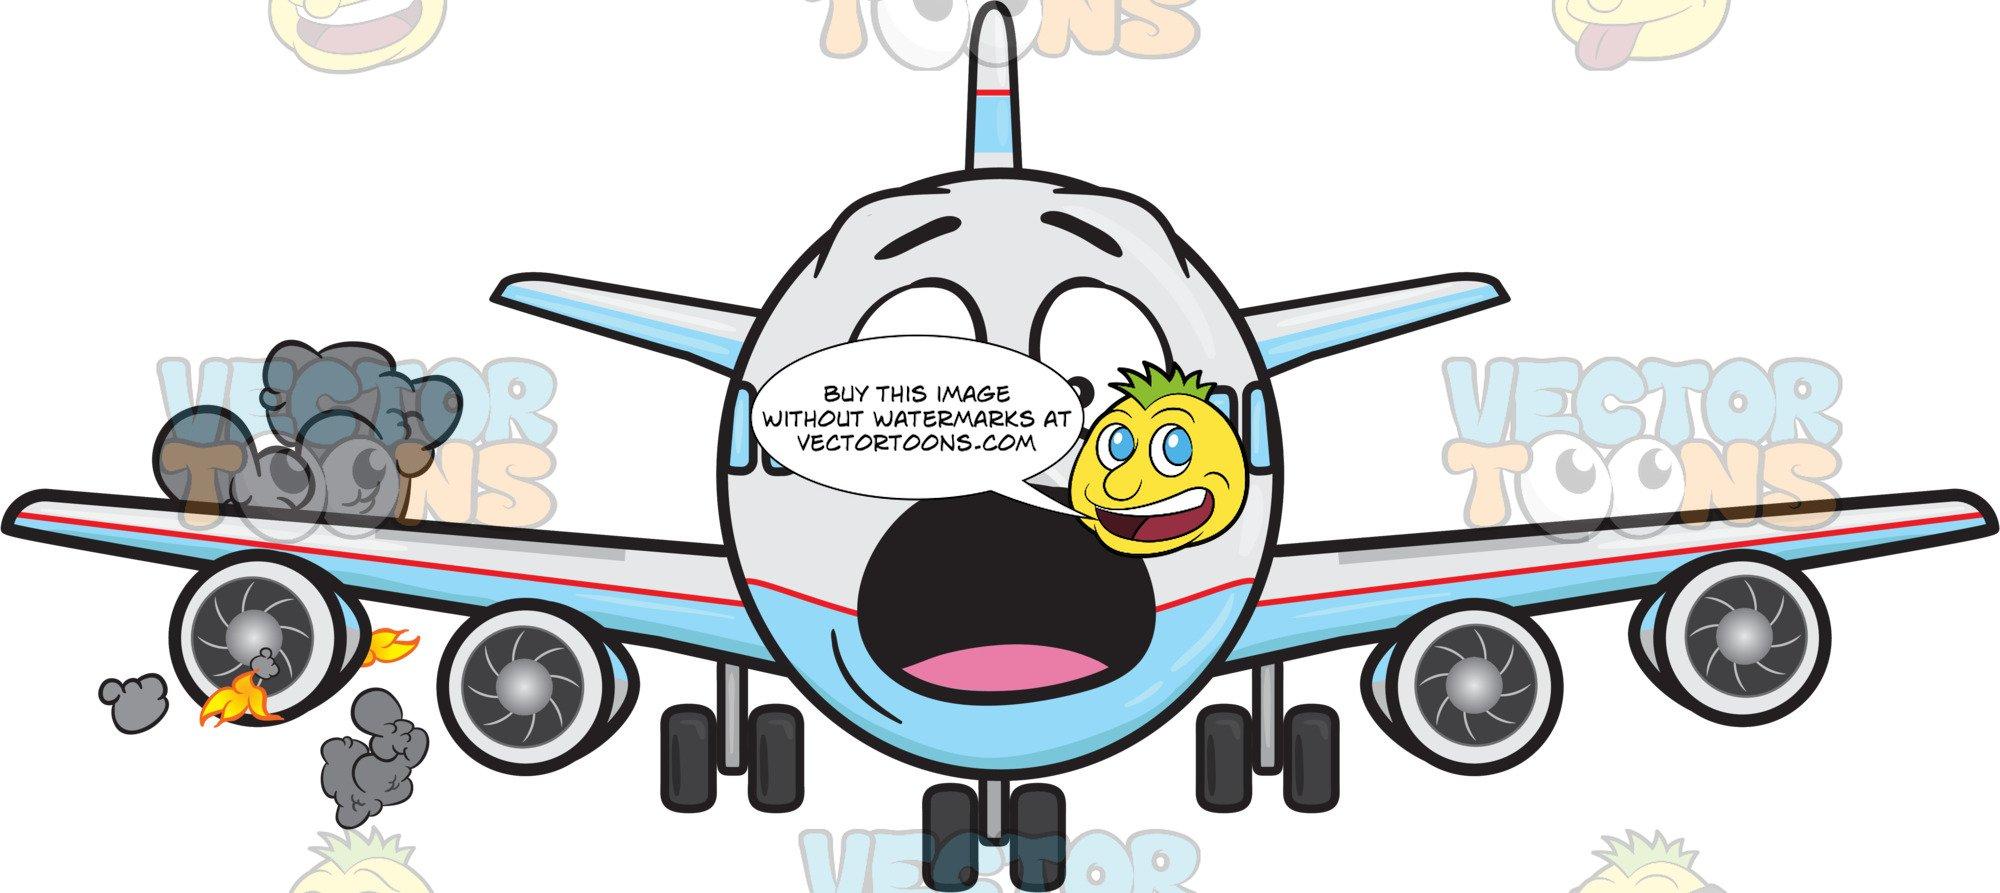 Startled jumbo jet plane. Engine clipart aircraft engine